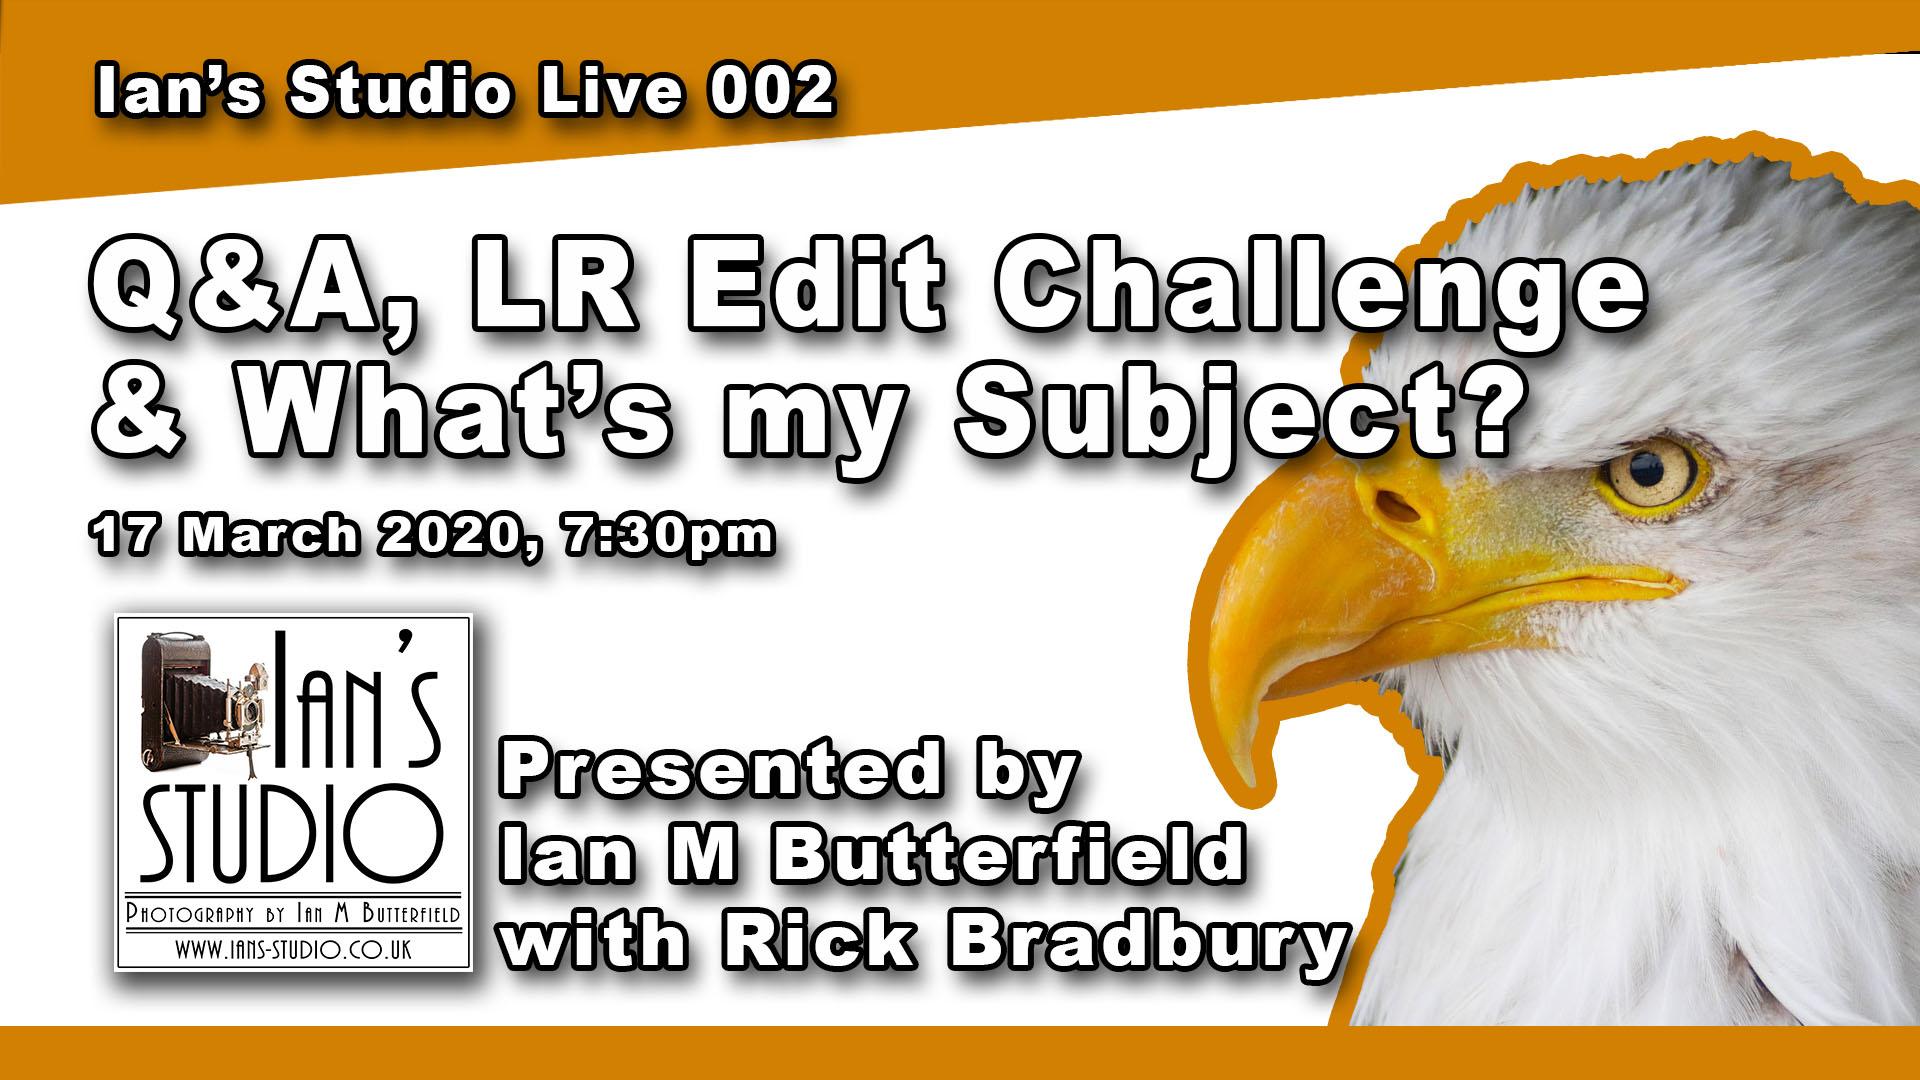 17 MAR 2020 LIVESTREAM FULL REPLAY: Ian's Studio Live #002 – Q&A, LR Edit Challenge & What's my Subject?